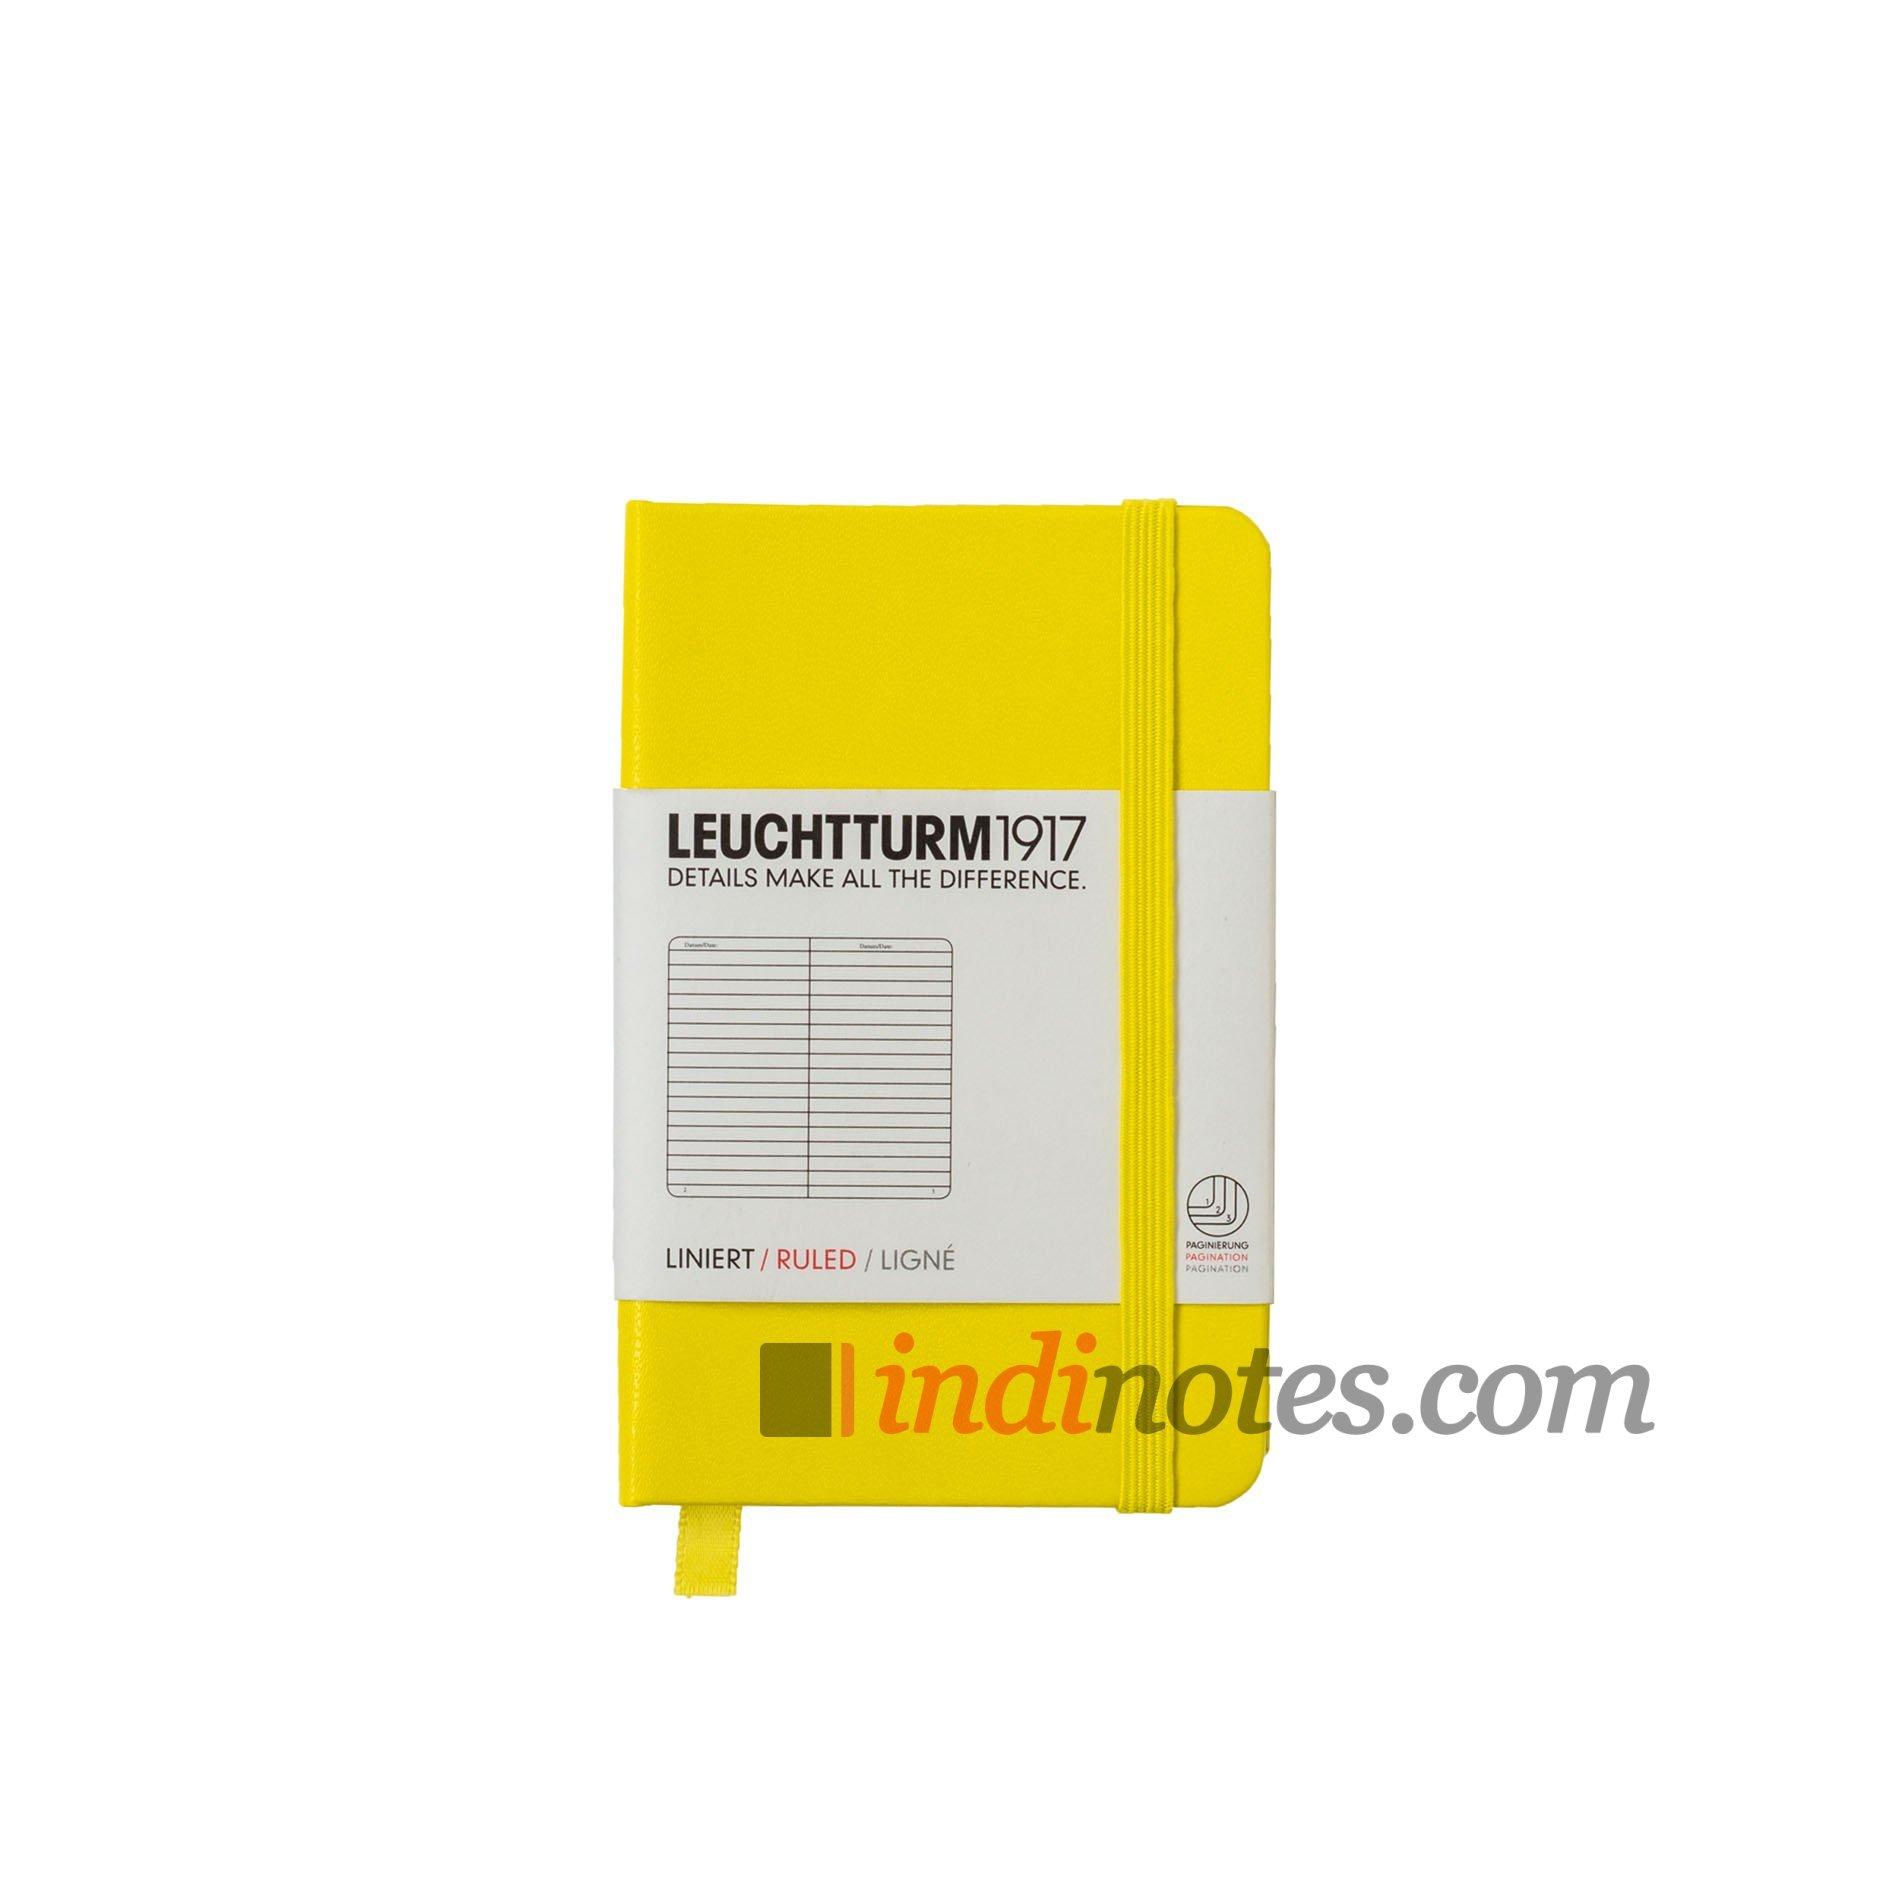 Leuchtturm1917 Mini Notebook Lemon